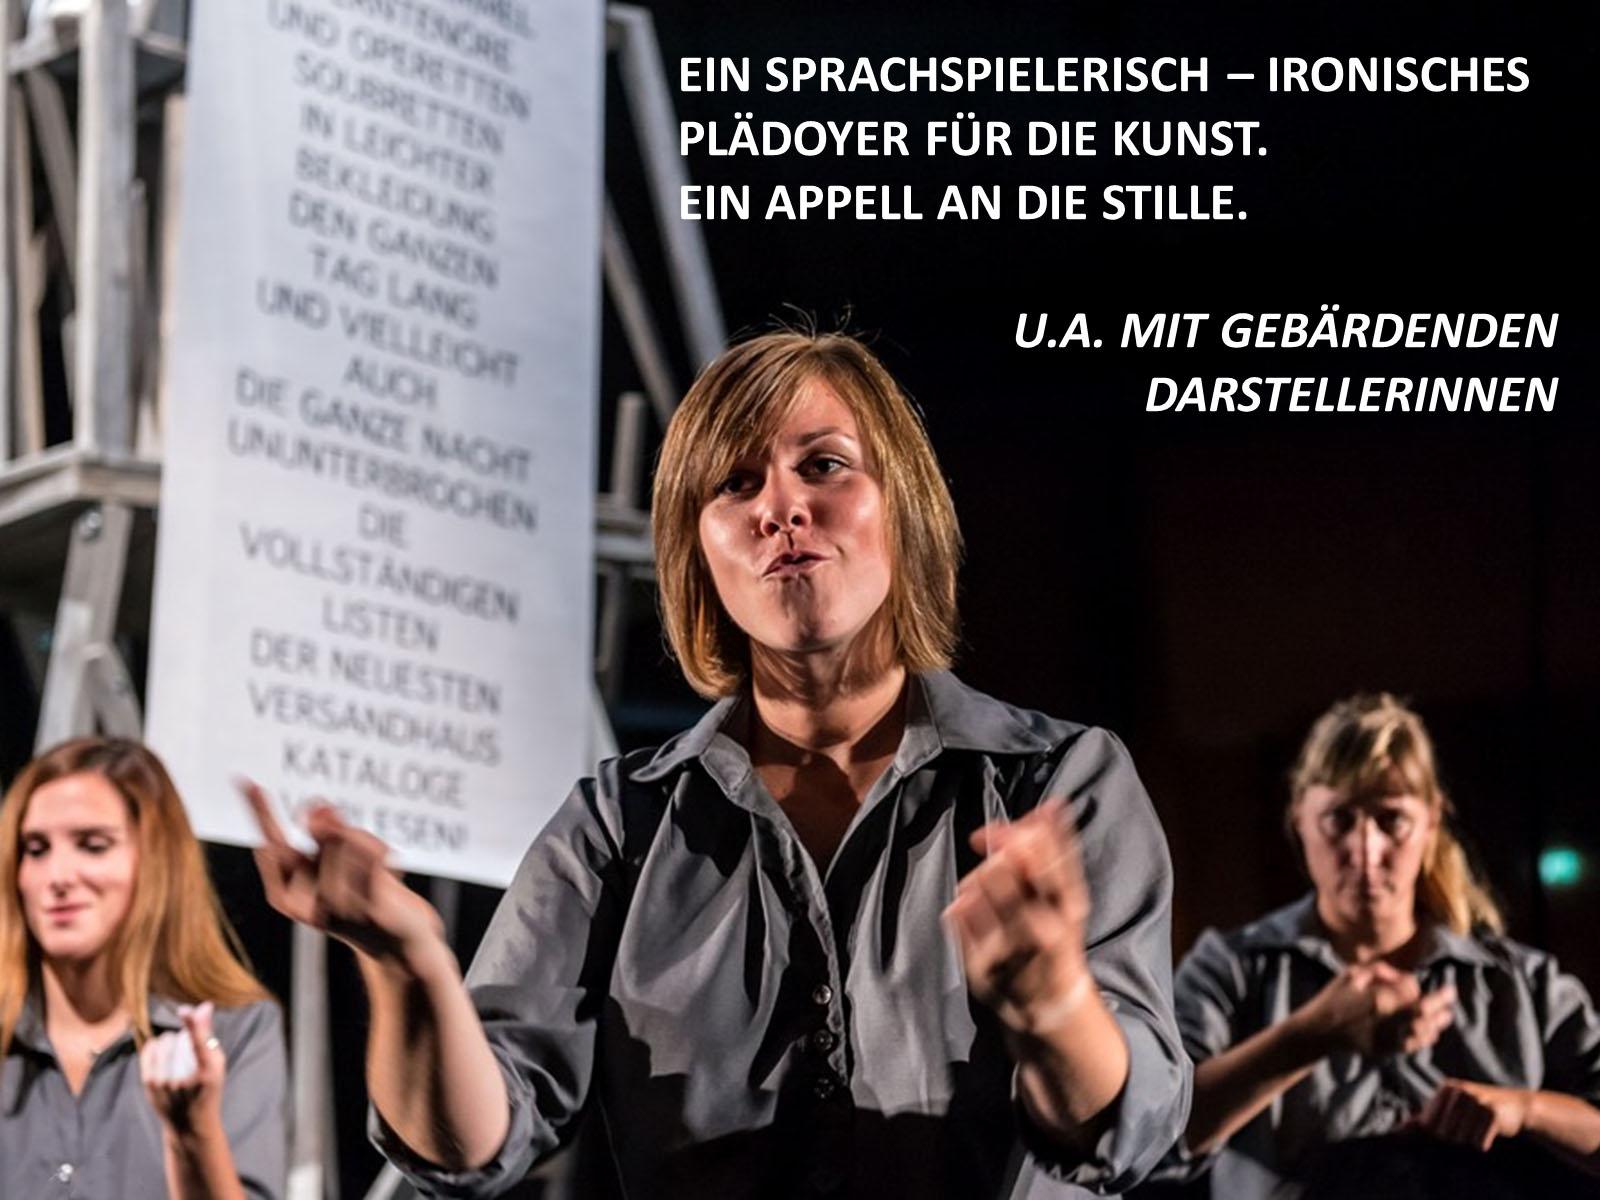 Chorphantasie | Odeïon Kulturforum Salzburg | 2014-09-18 bis 2014-10-23 | Foto © Albert Moser | 3